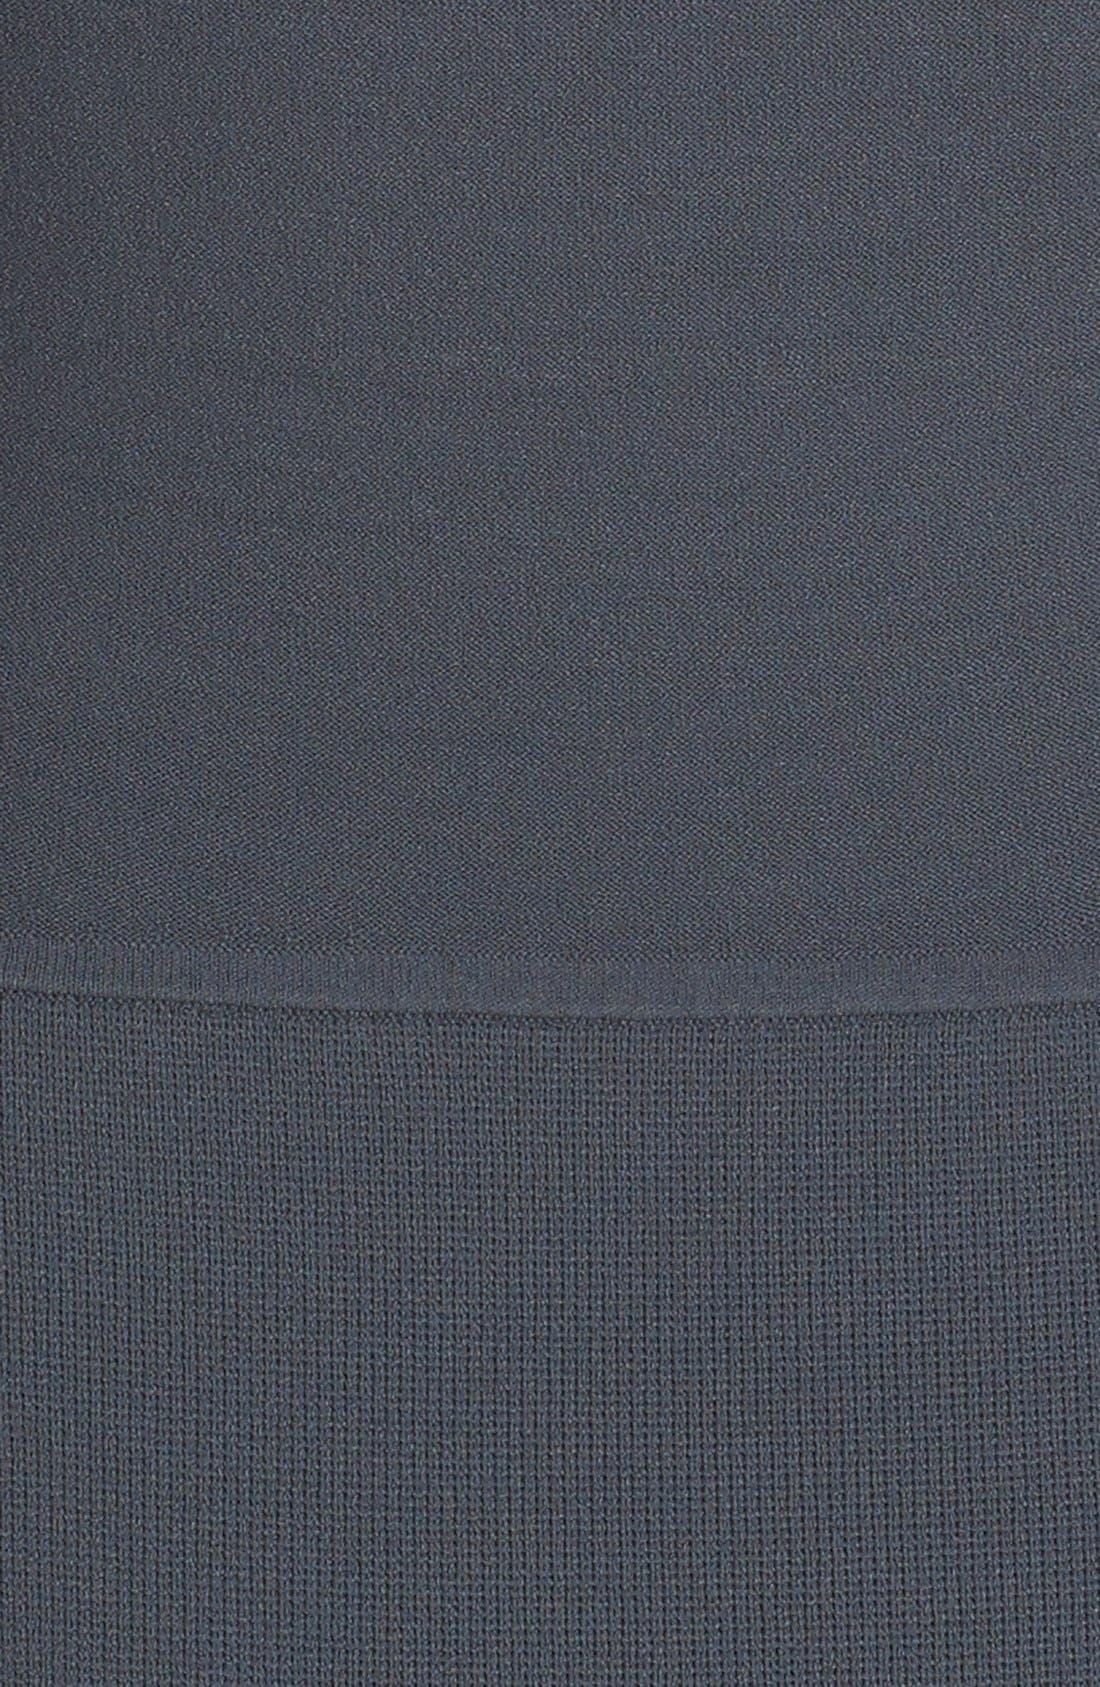 Alternate Image 3  - Narciso Rodriguez Double Knit Midi Sheath Dress